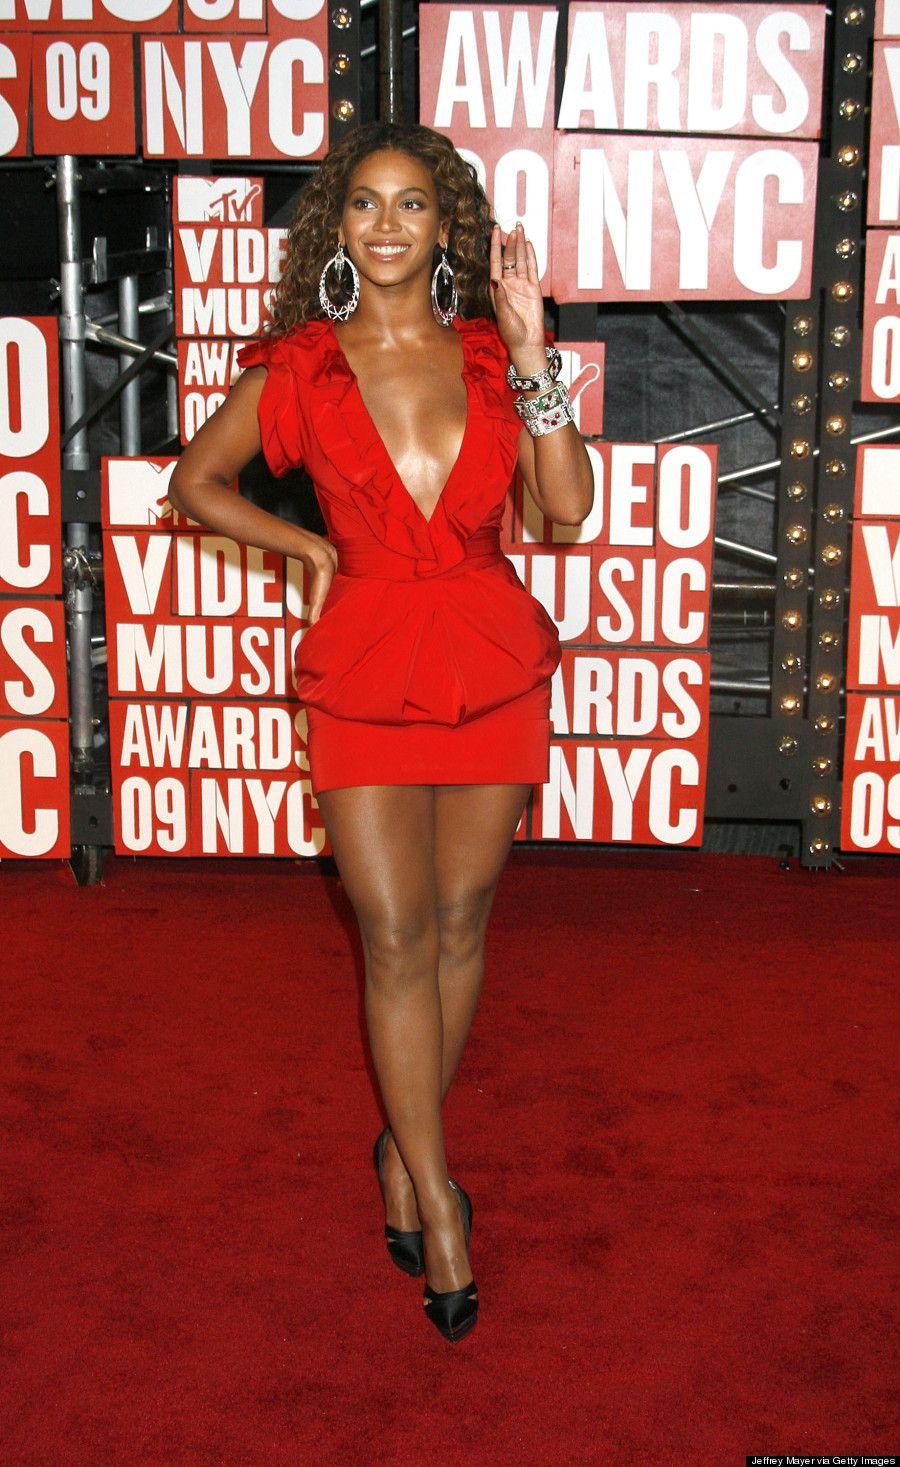 Beyonce Ring The Alarm World Music Awards